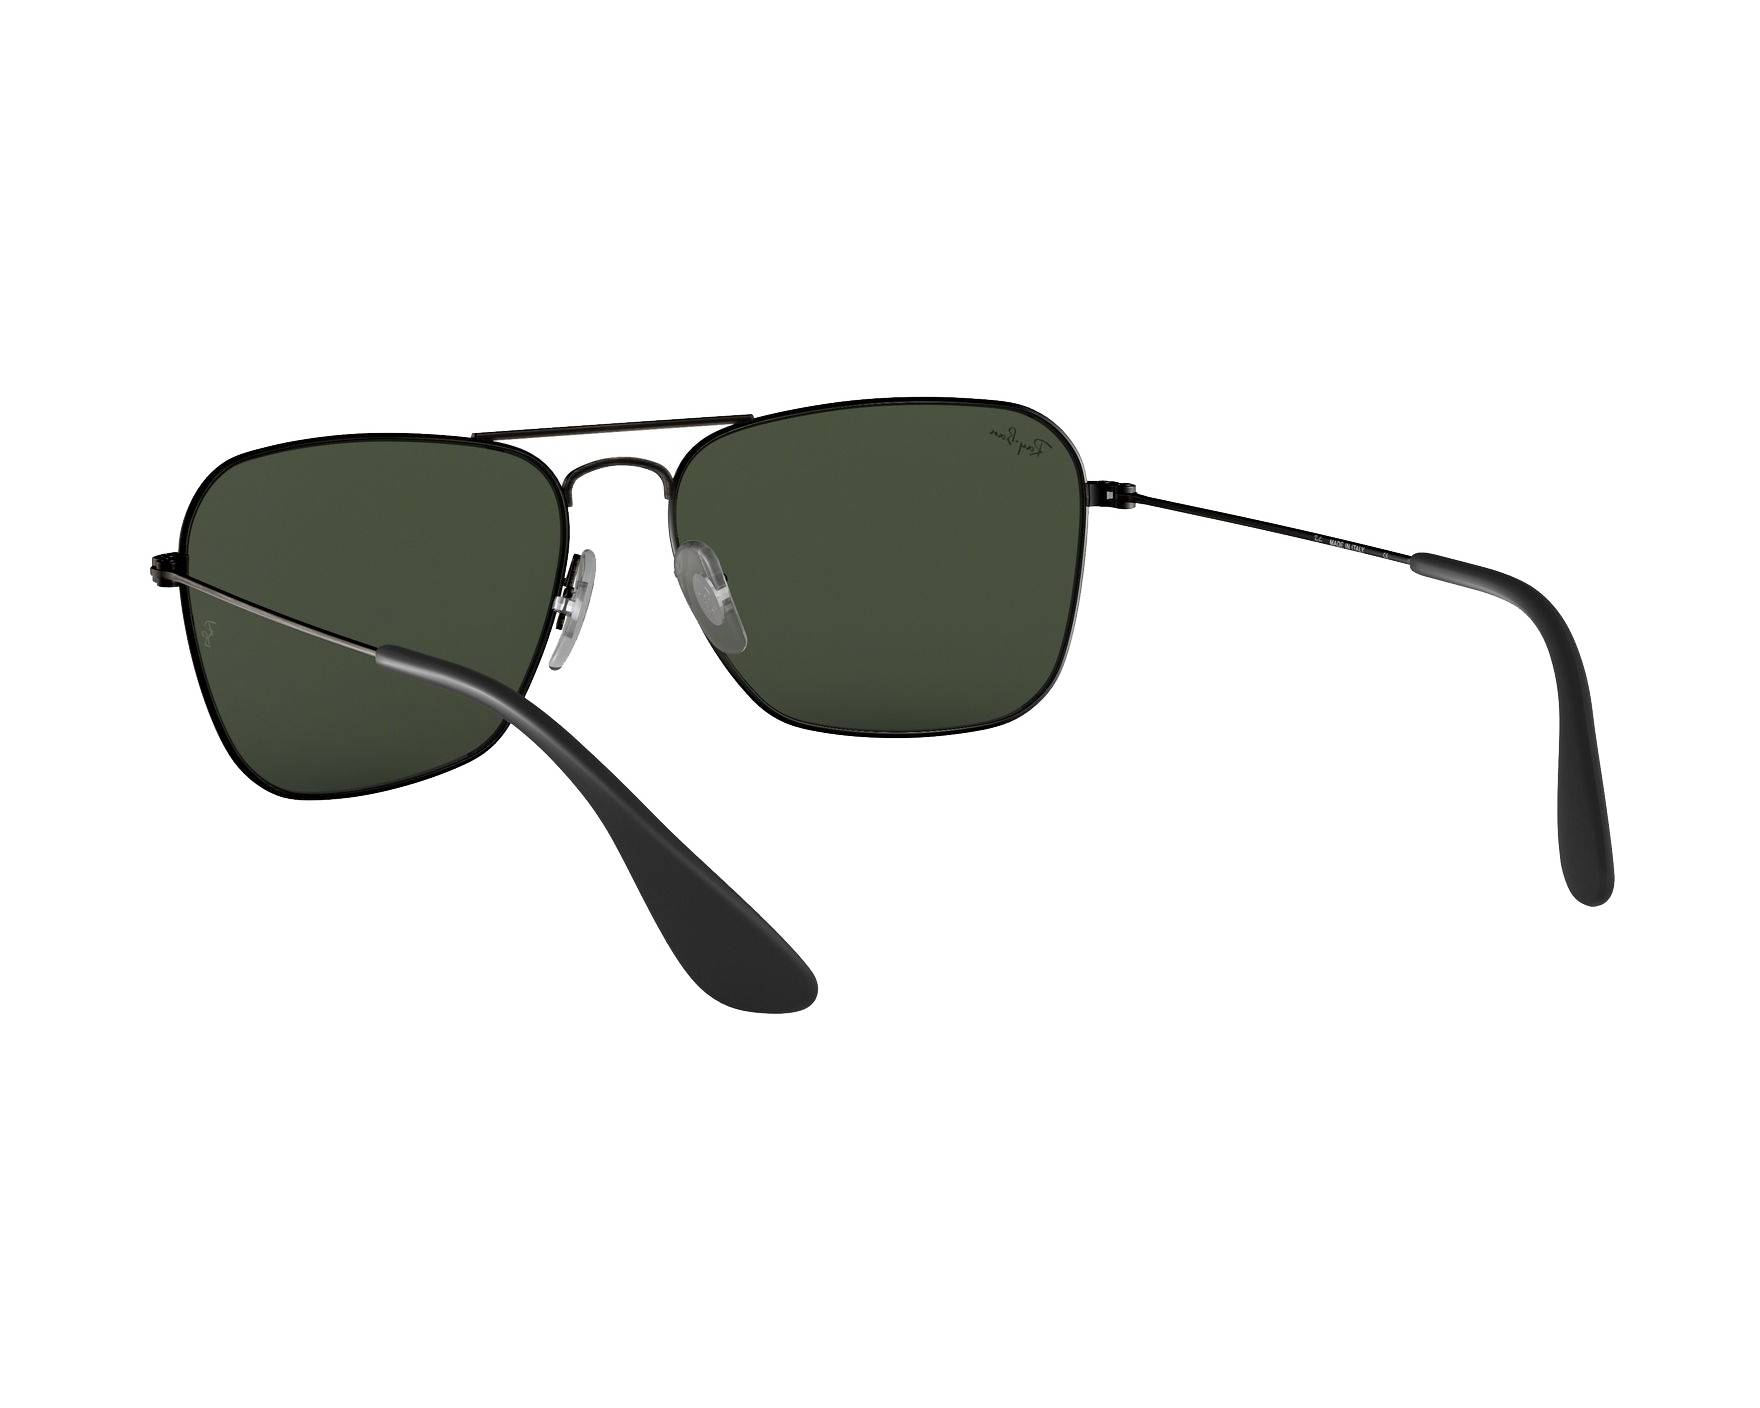 2b22d0f5ab6 Sunglasses Ray-Ban RB-3610 913971 58-15 Gun 360 degree view 6